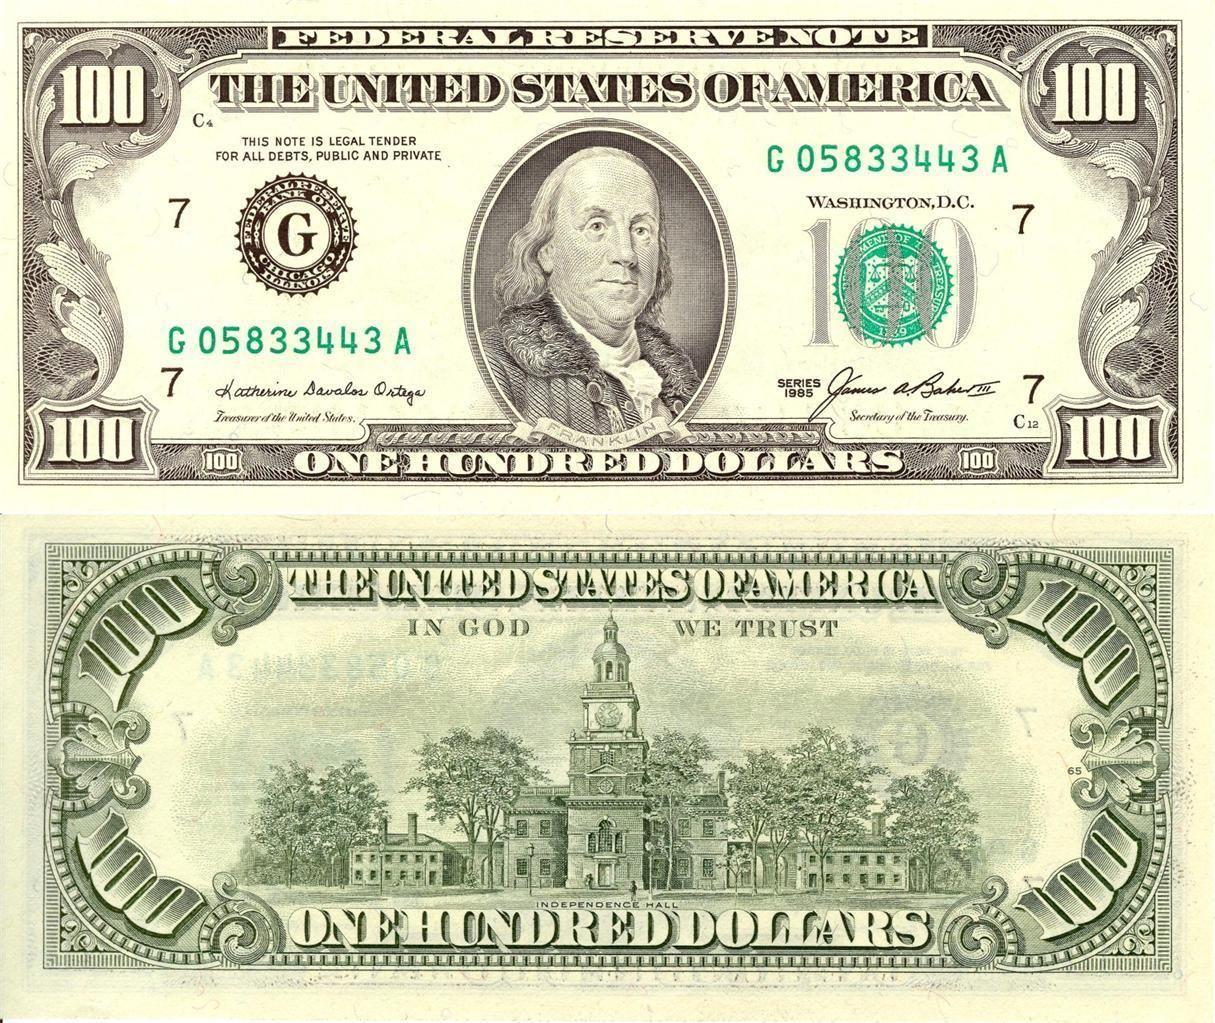 Details about BEN FRANKLIN HUNDRED DOLLAR BILL GLOSSY POSTER.